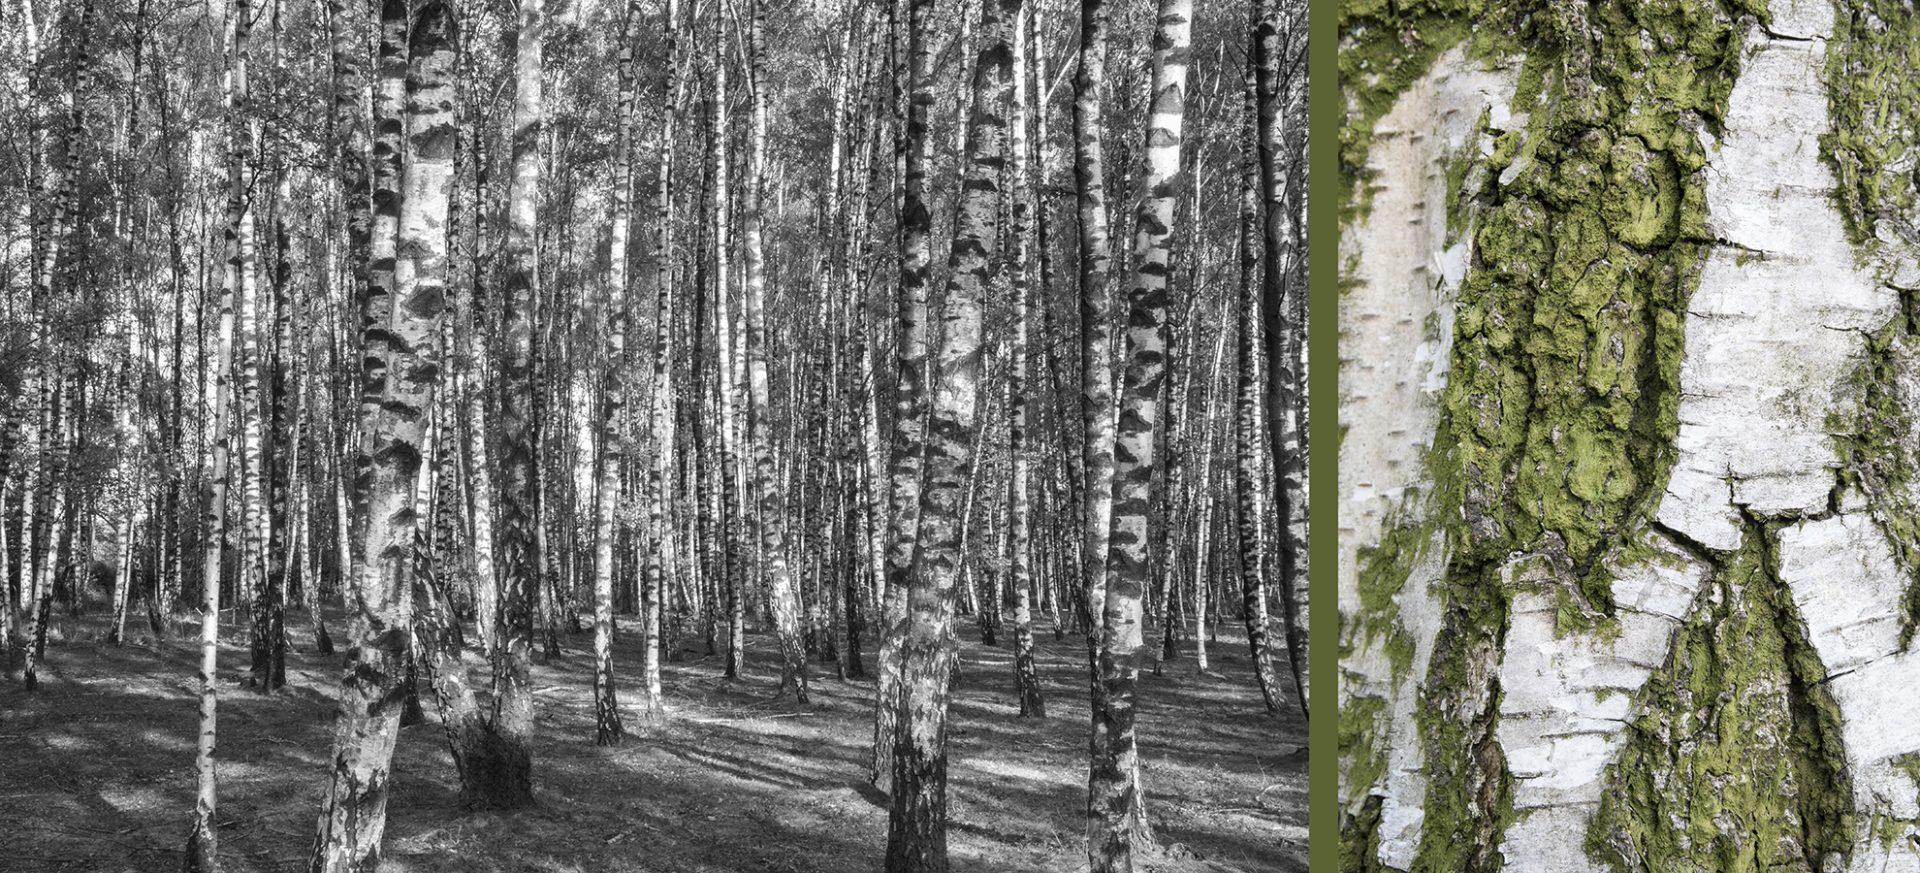 WaldRindenDoppel Birken I • Lambda-Print auf KODAK Pro Endura, Alu-Dibond®, 110 x 50 cm, gerahmt als Art-Box • Auflage: 5 + 2 Artist's Proof